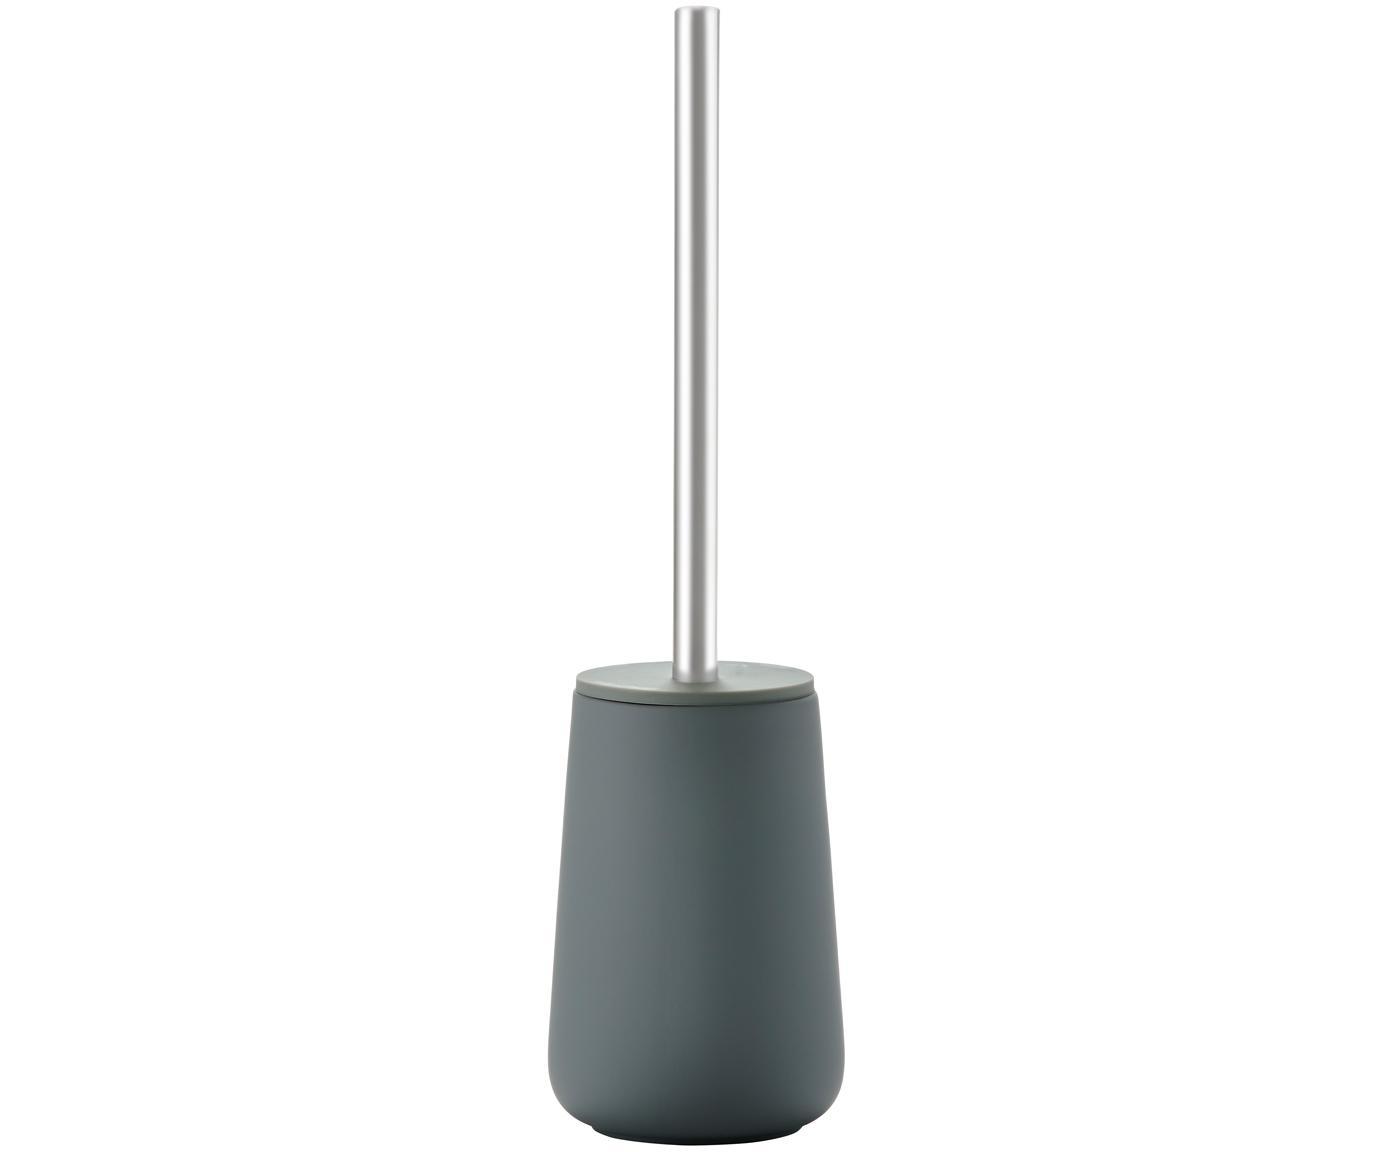 Scopino Brush, Contenitore: porcellana, Grigio opaco, acciaio inossidabile, Ø 10 x Alt. 43 cm